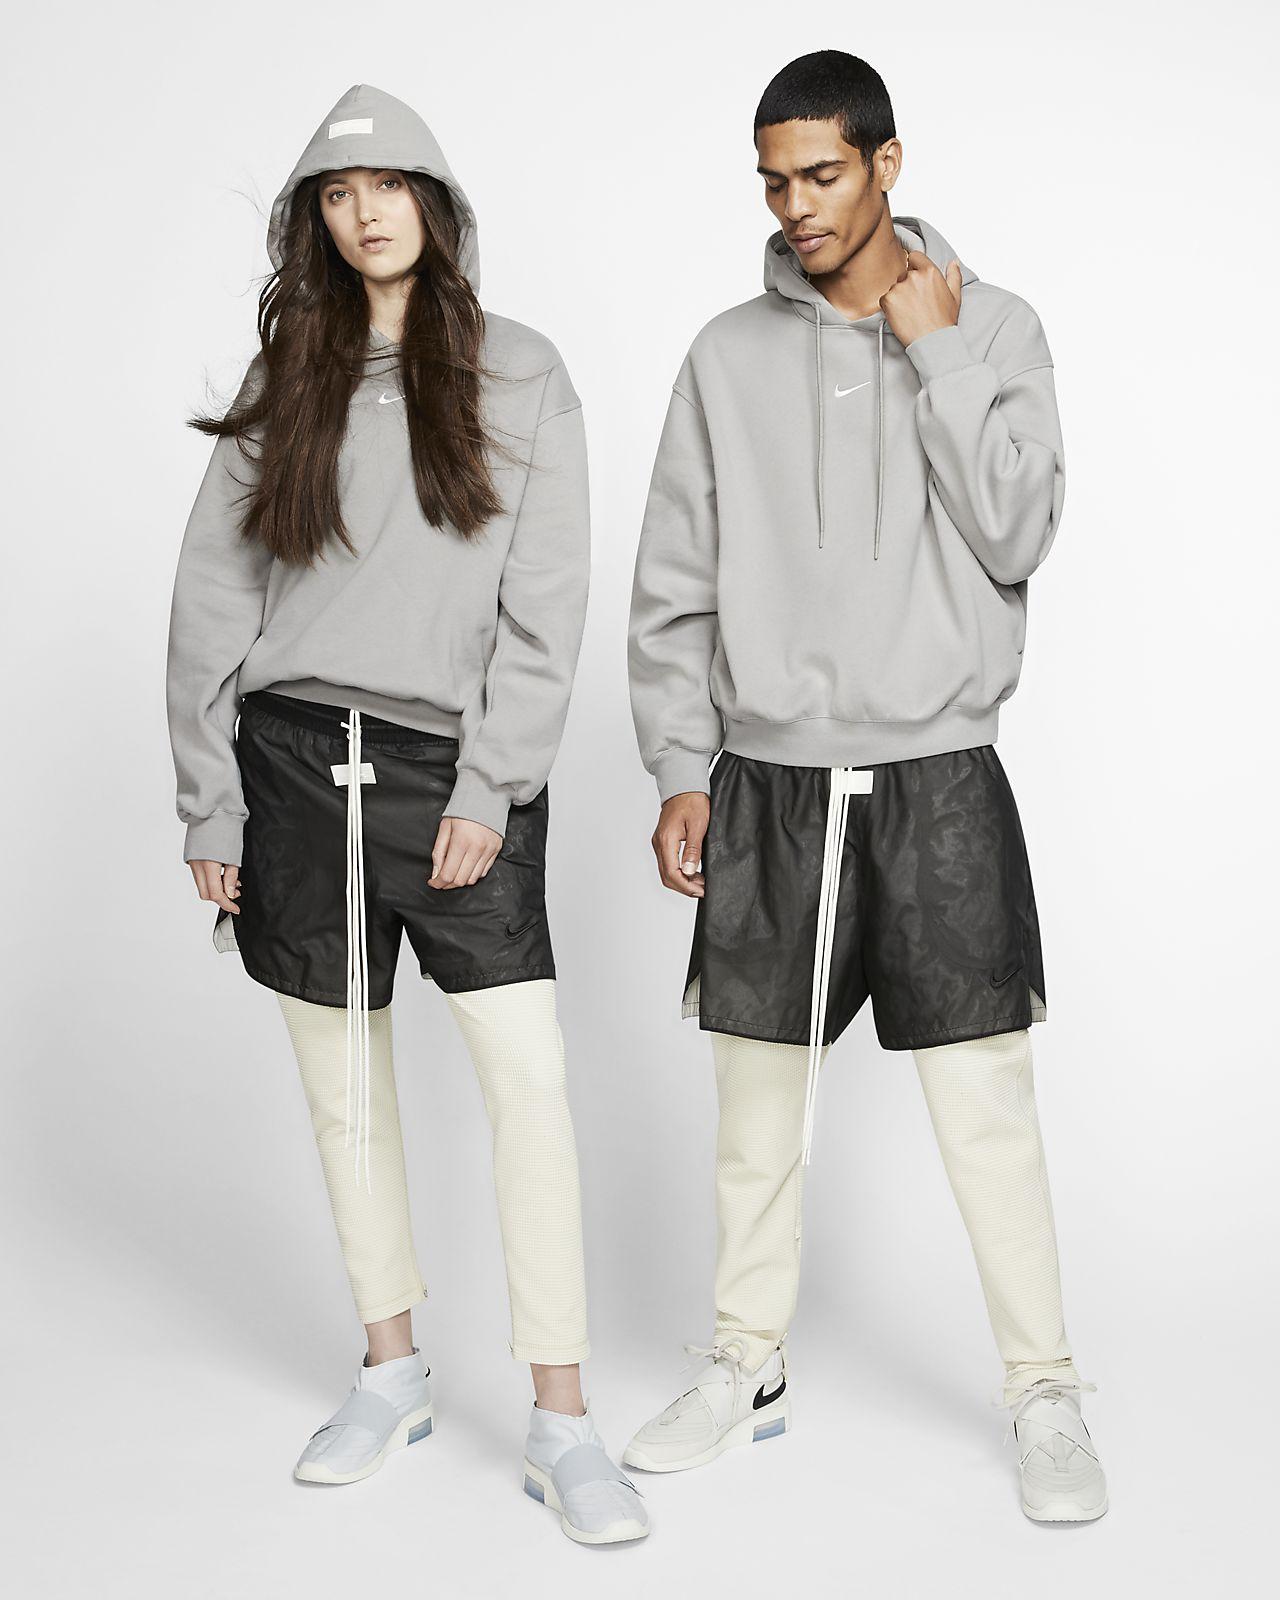 Nike x Fear of God Men's Pullover Hoodie